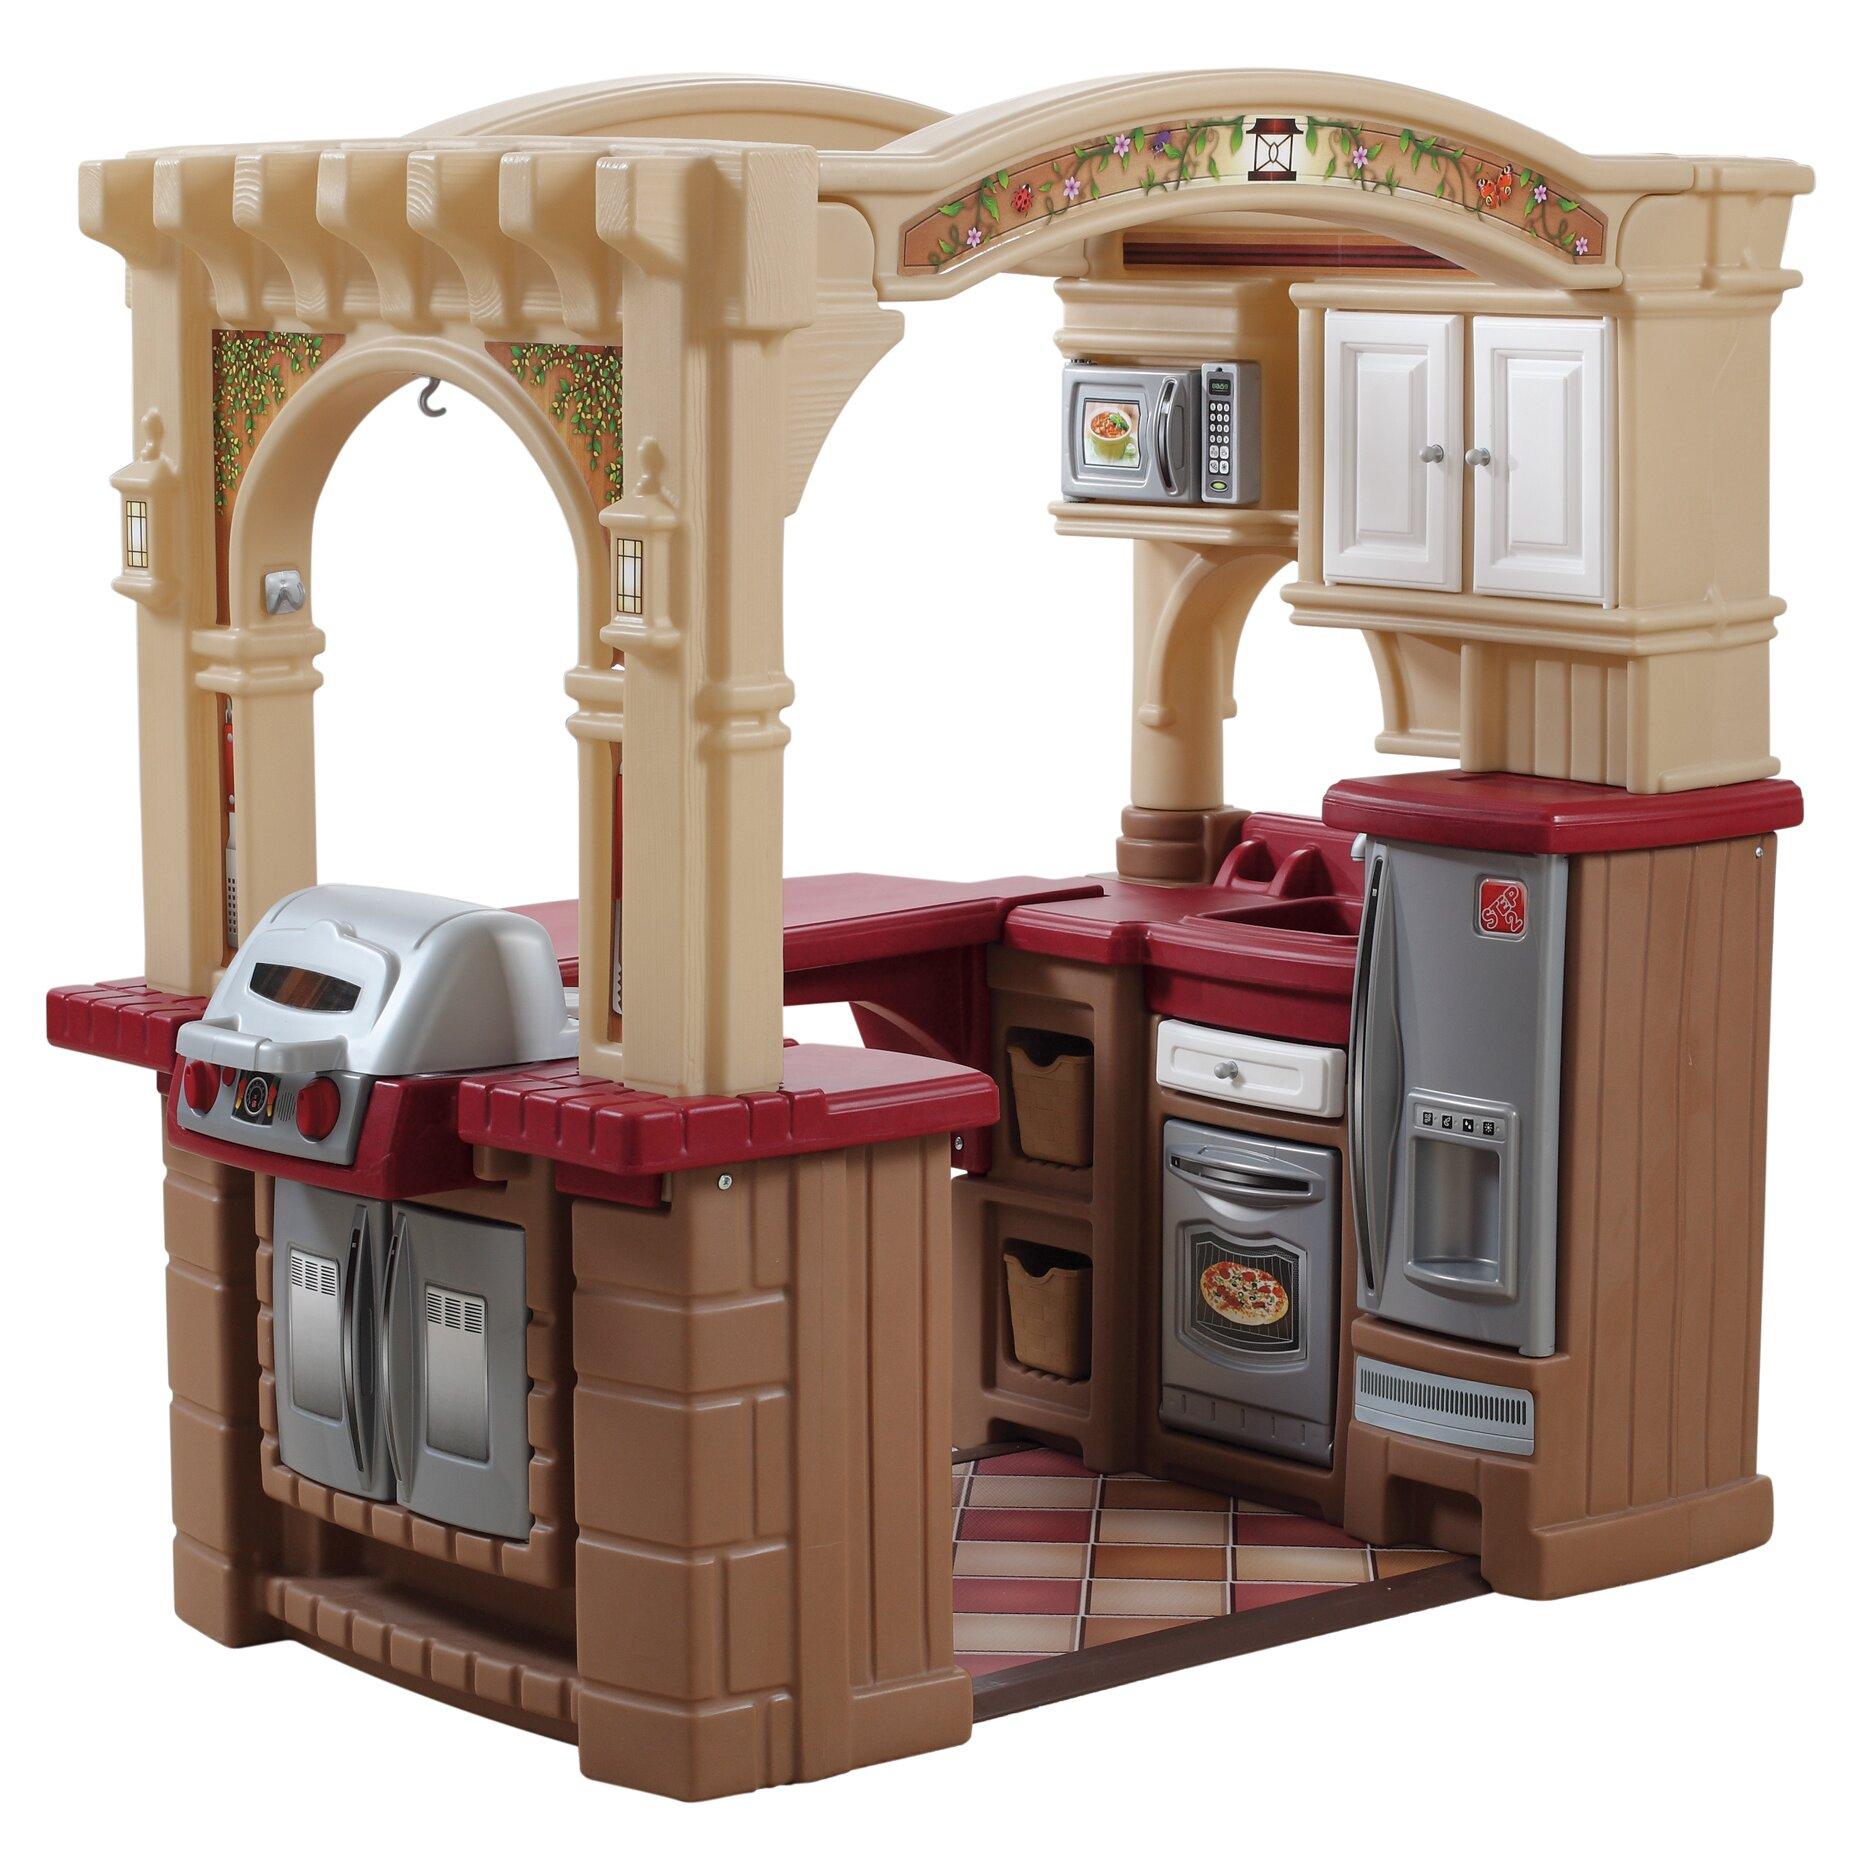 Retro Play Kitchen Set Play Kitchen Sets Accessories Youll Love Wayfair